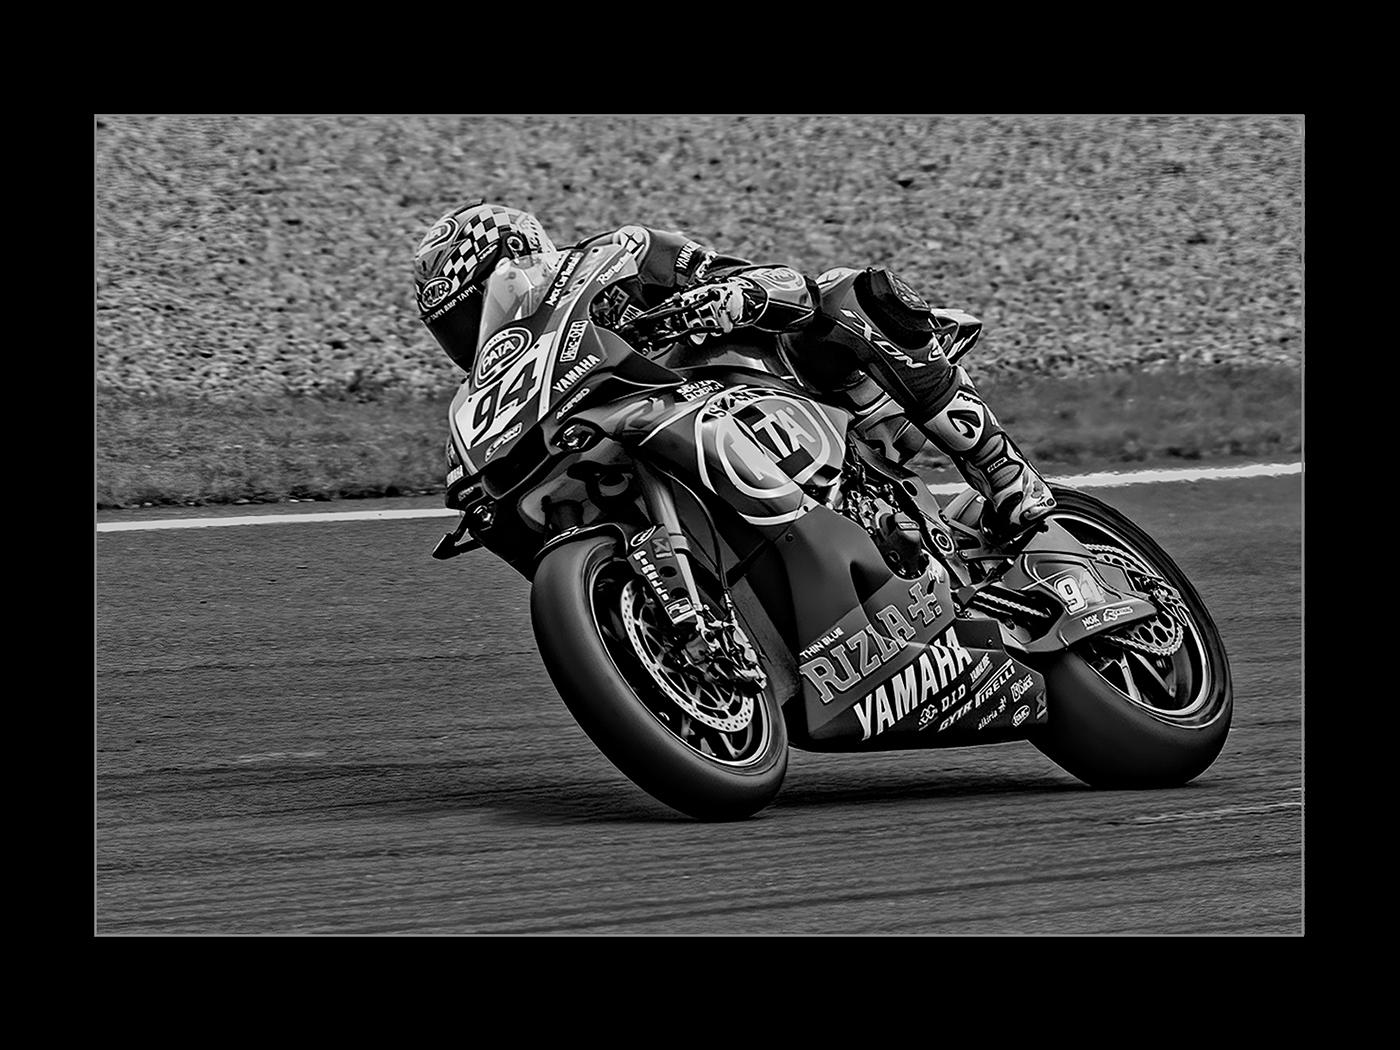 Racing on two Wheels